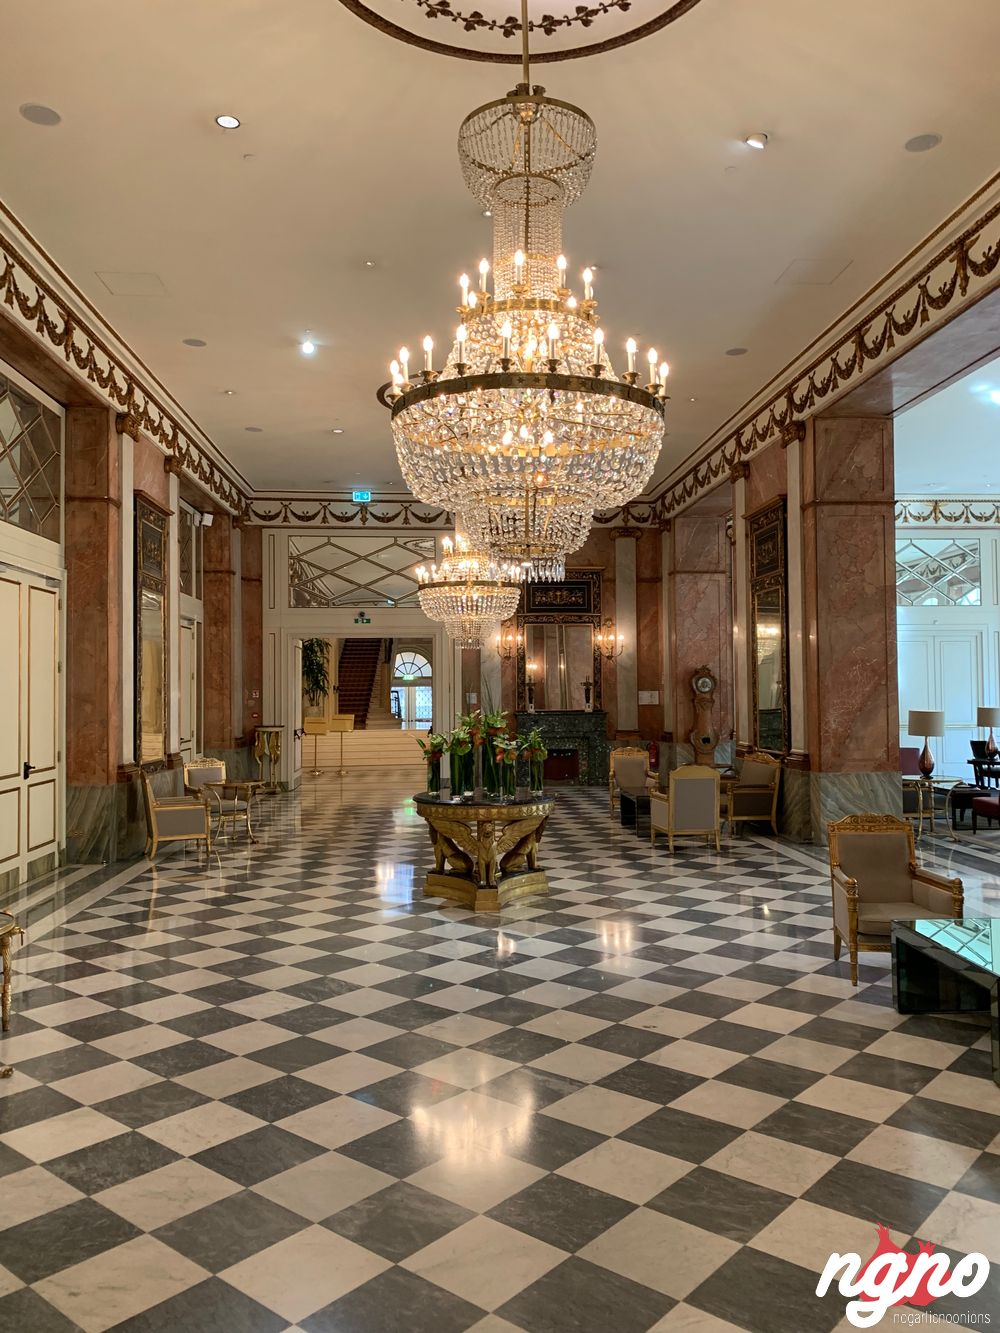 westin-hotel-roma-italia-nogarlicnoonions-1322018-10-26-04-20-59